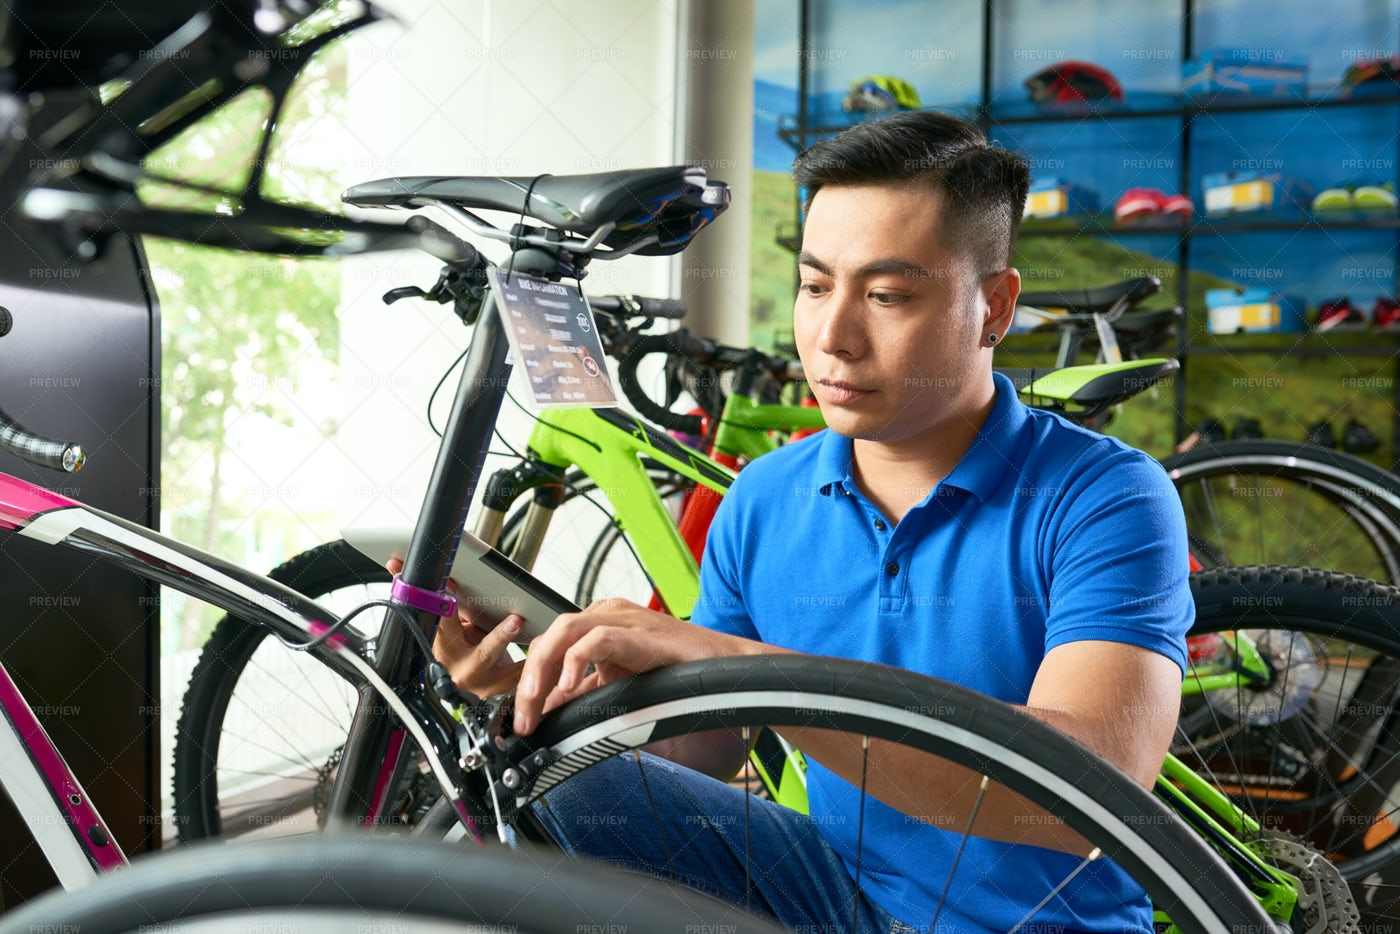 Salesman Assembling Bike: Stock Photos